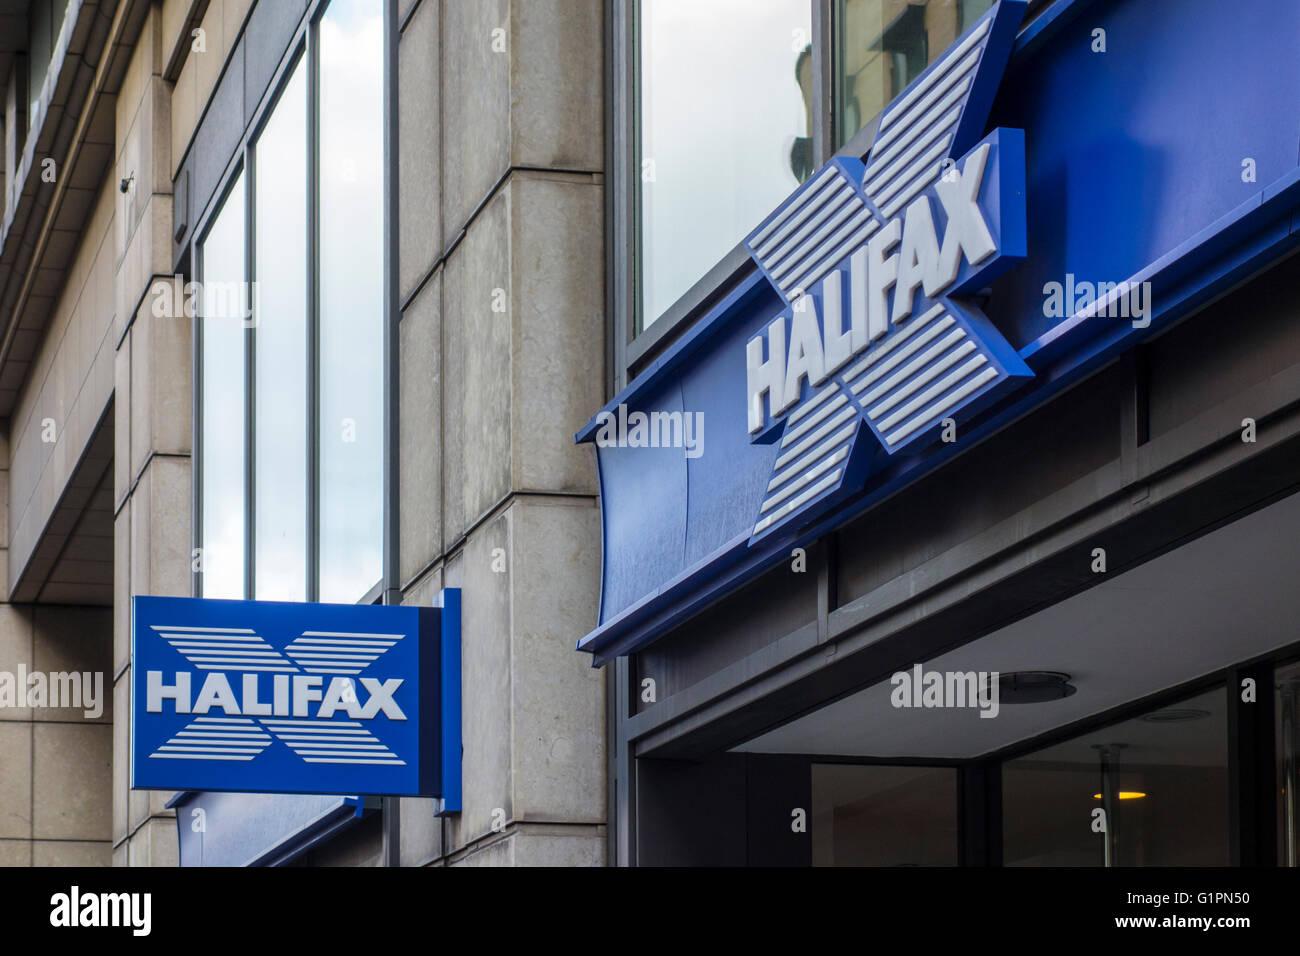 Halifax Bank-Filiale, Old Broad Street, London, UK Stockbild